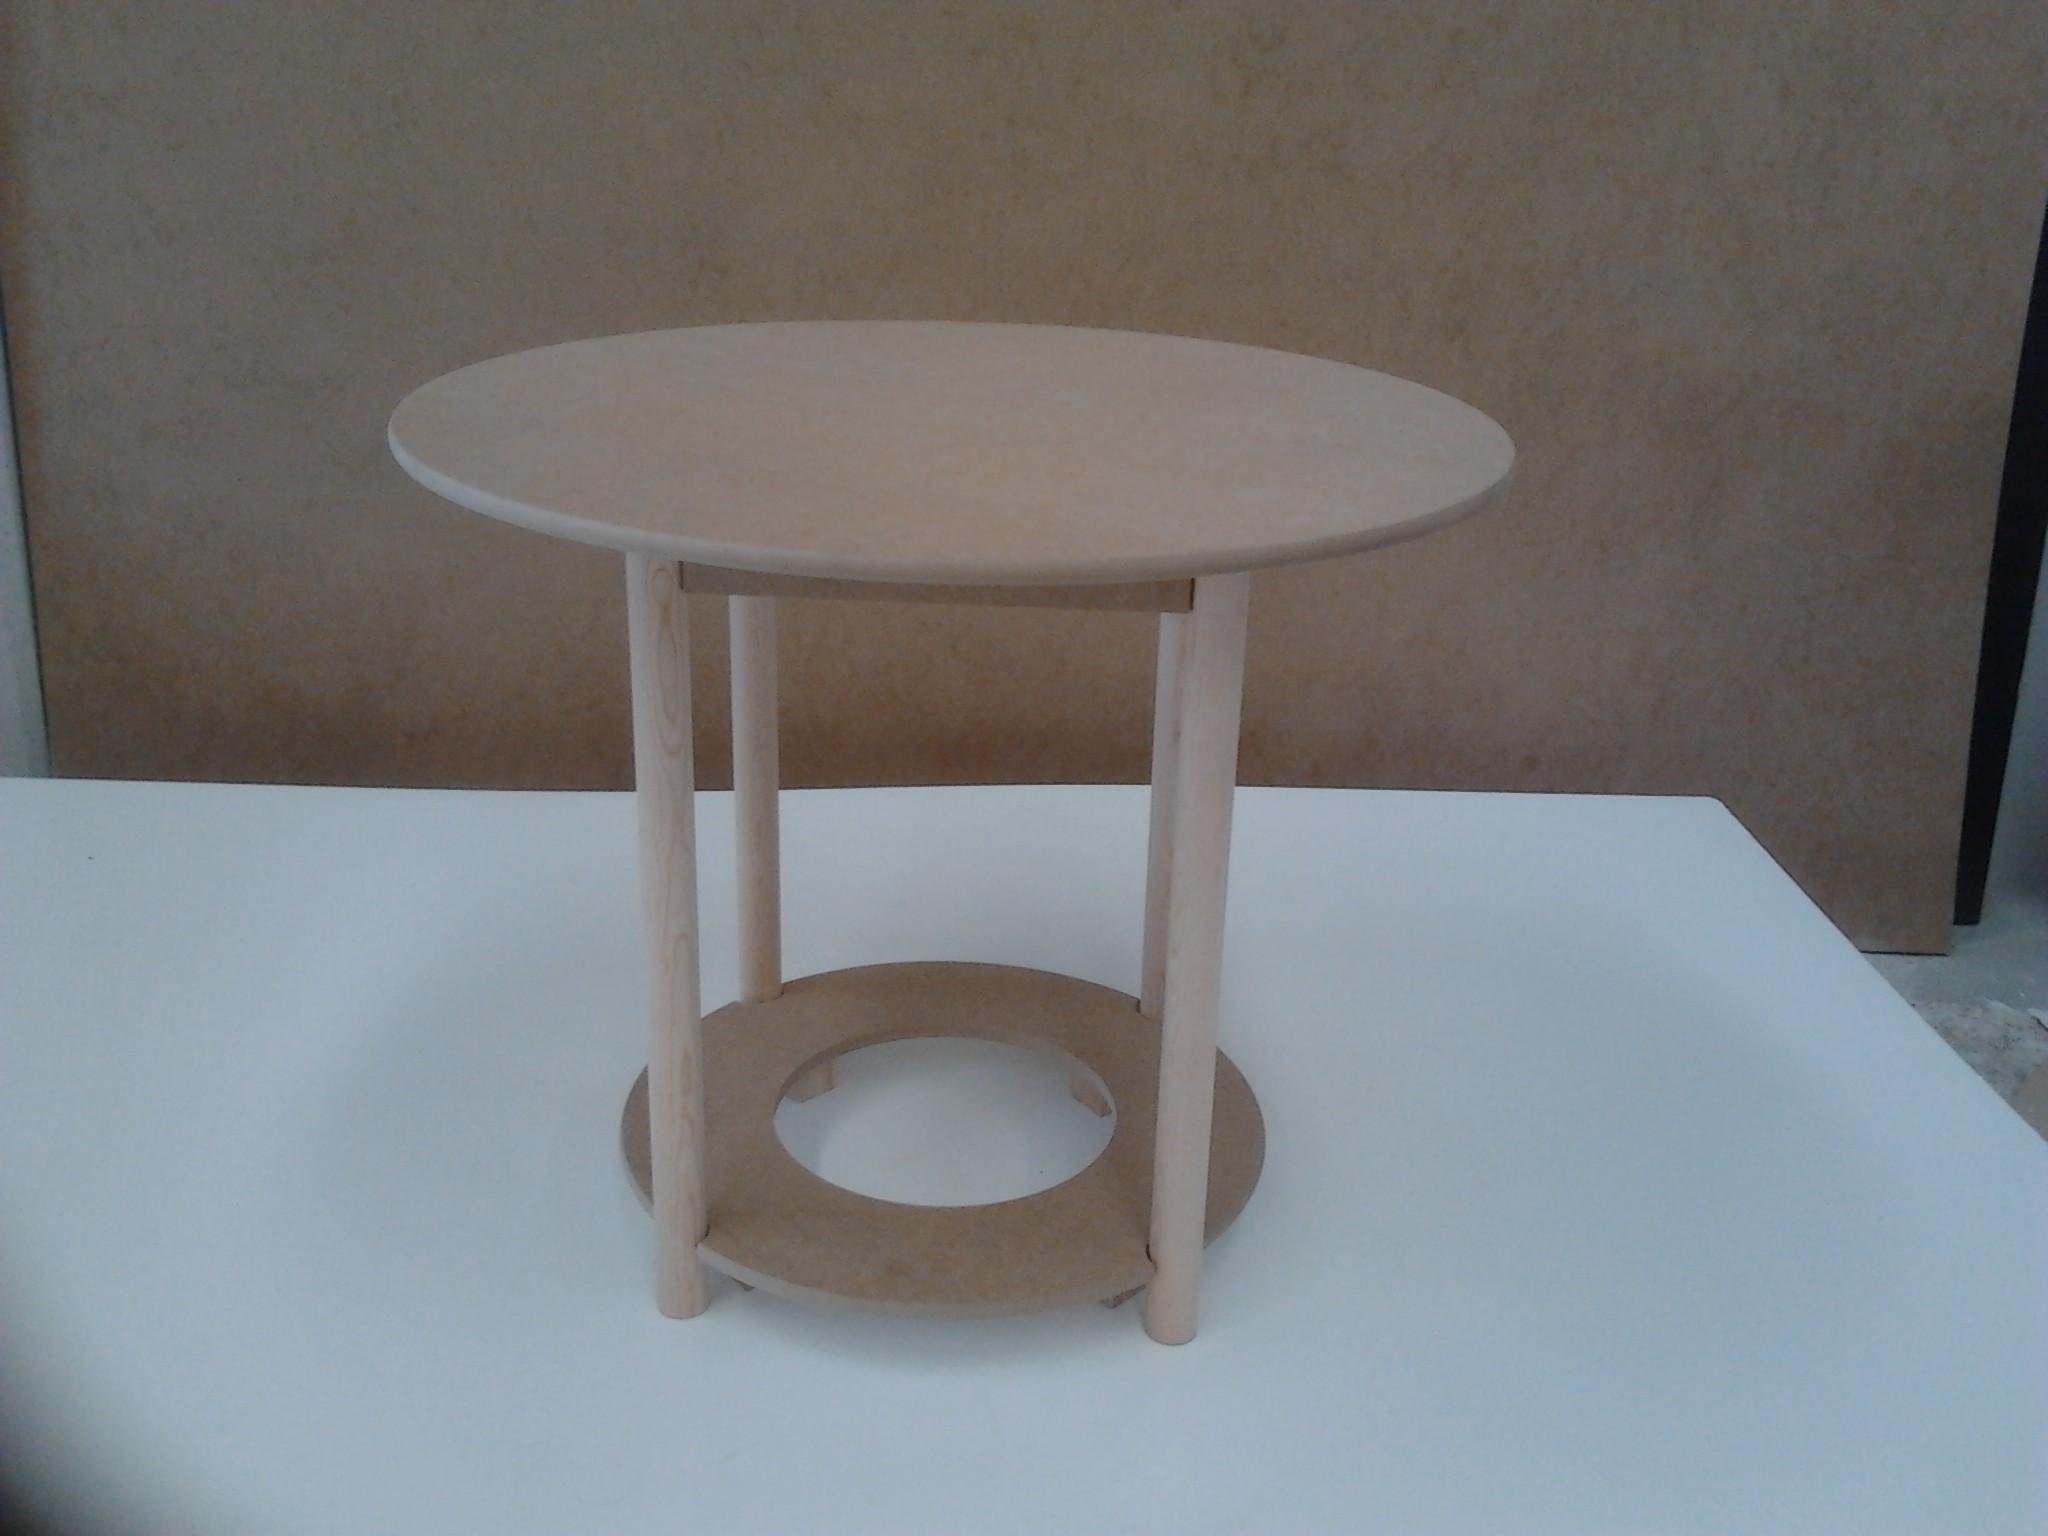 Foto mesa camilla dm 100x60 cm foto 531080 - Mesa camilla redonda ...